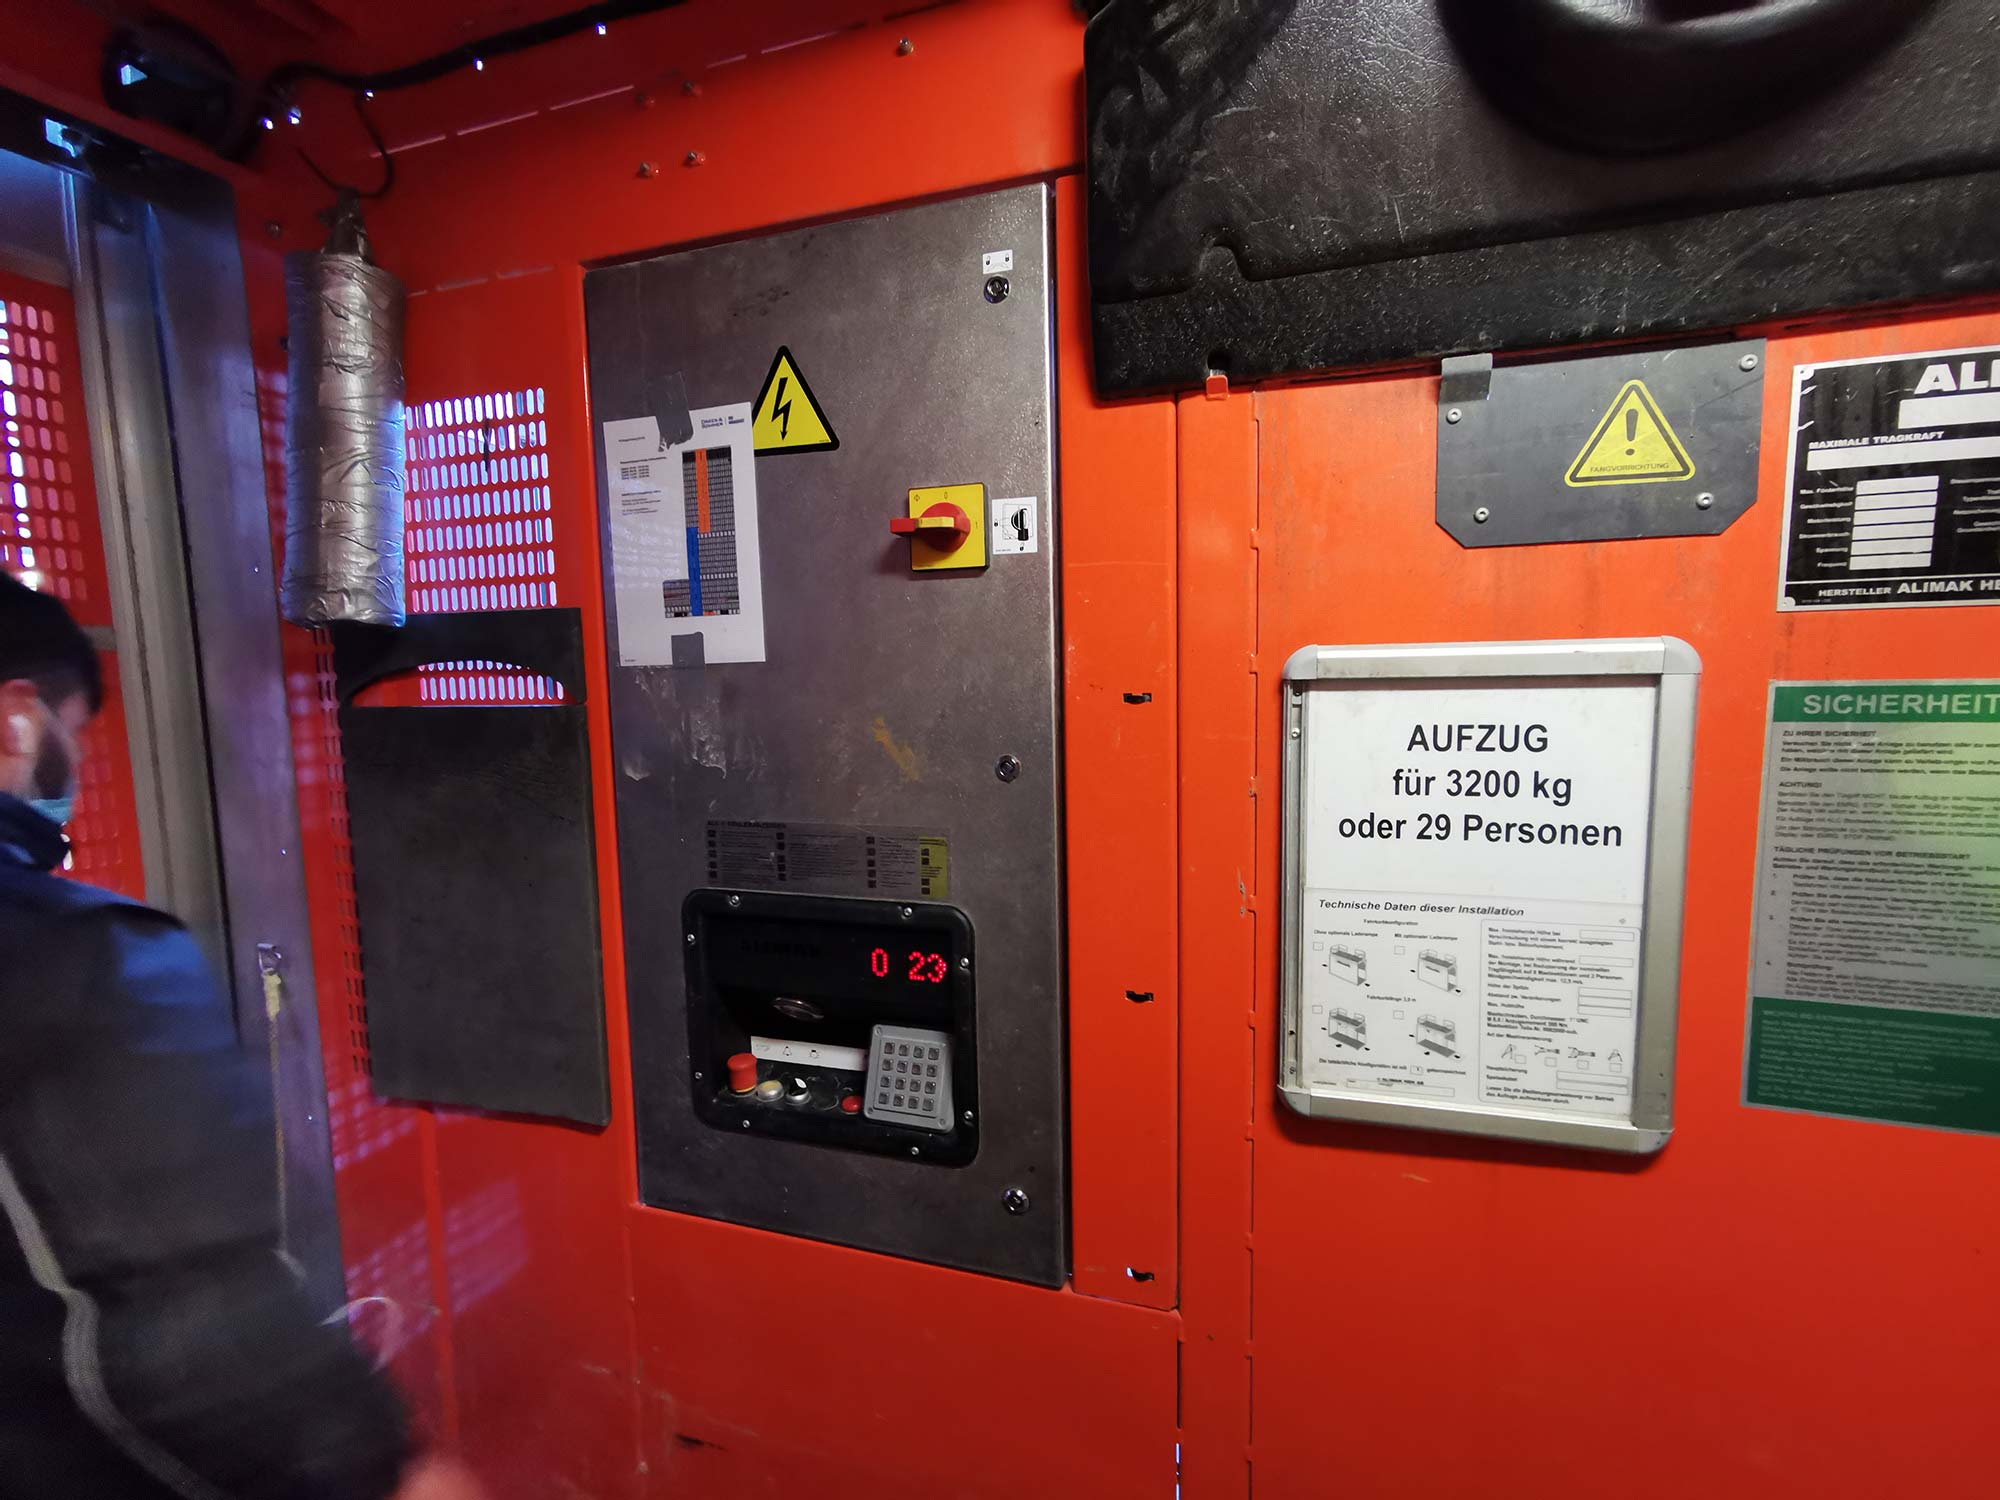 Bauaufzug Alimak Hek - Alimak Baustellen-Aufzug